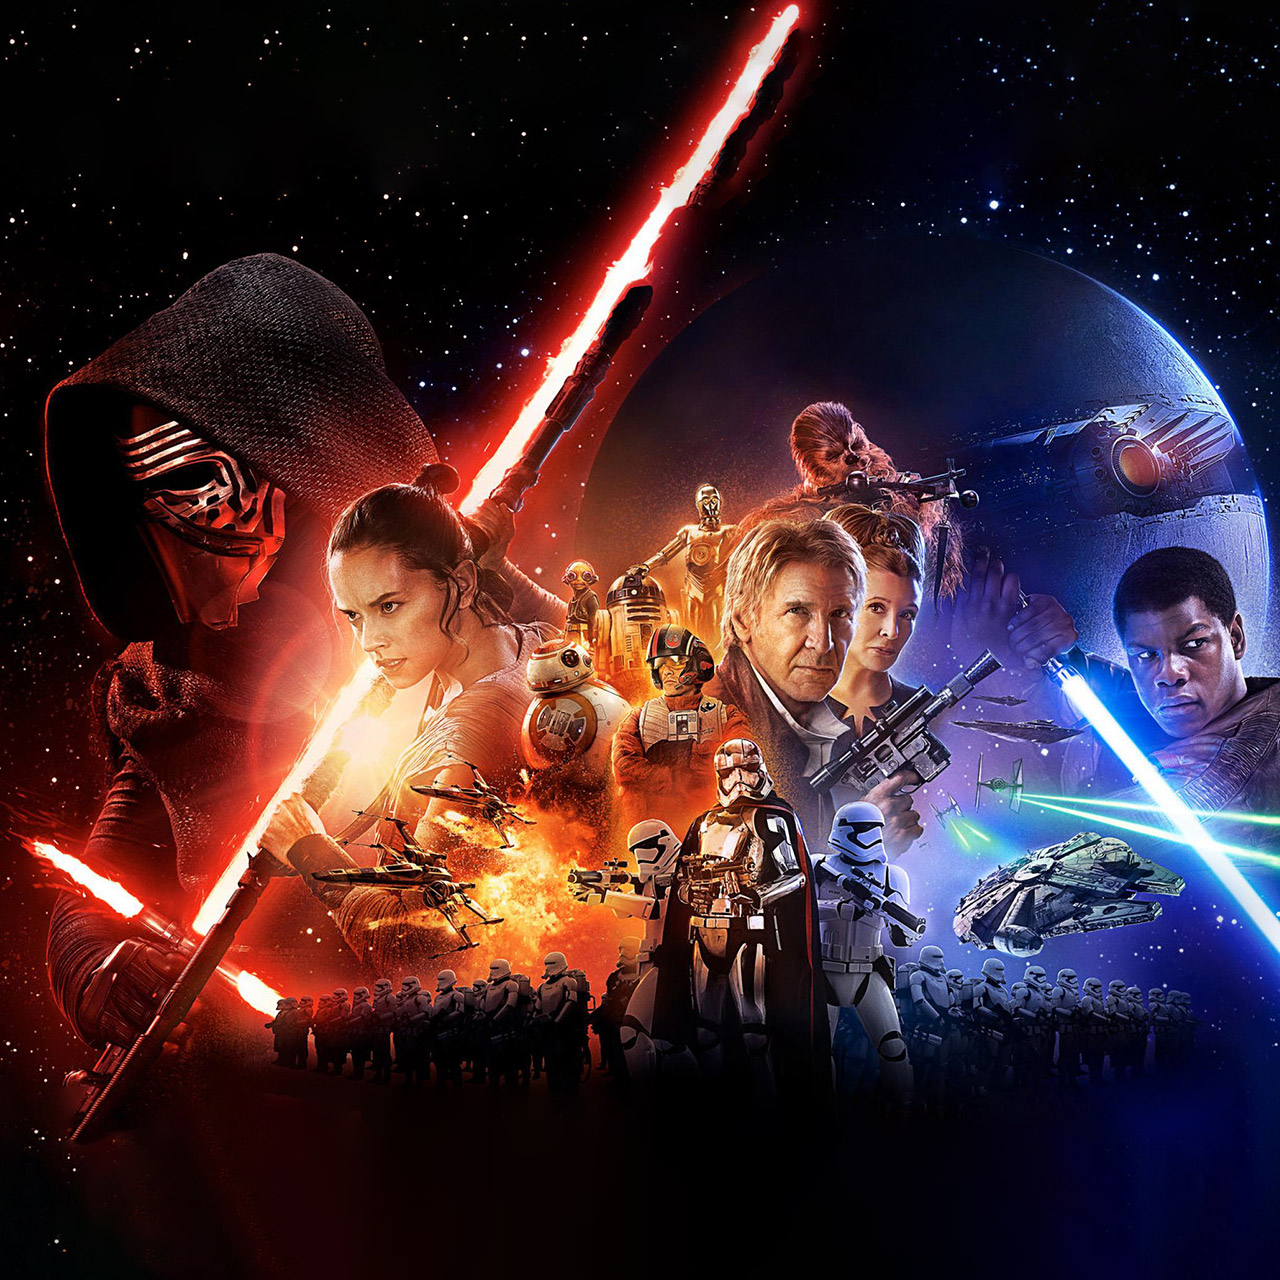 Star Wars The Force Awakens wallpaper 1280x1280